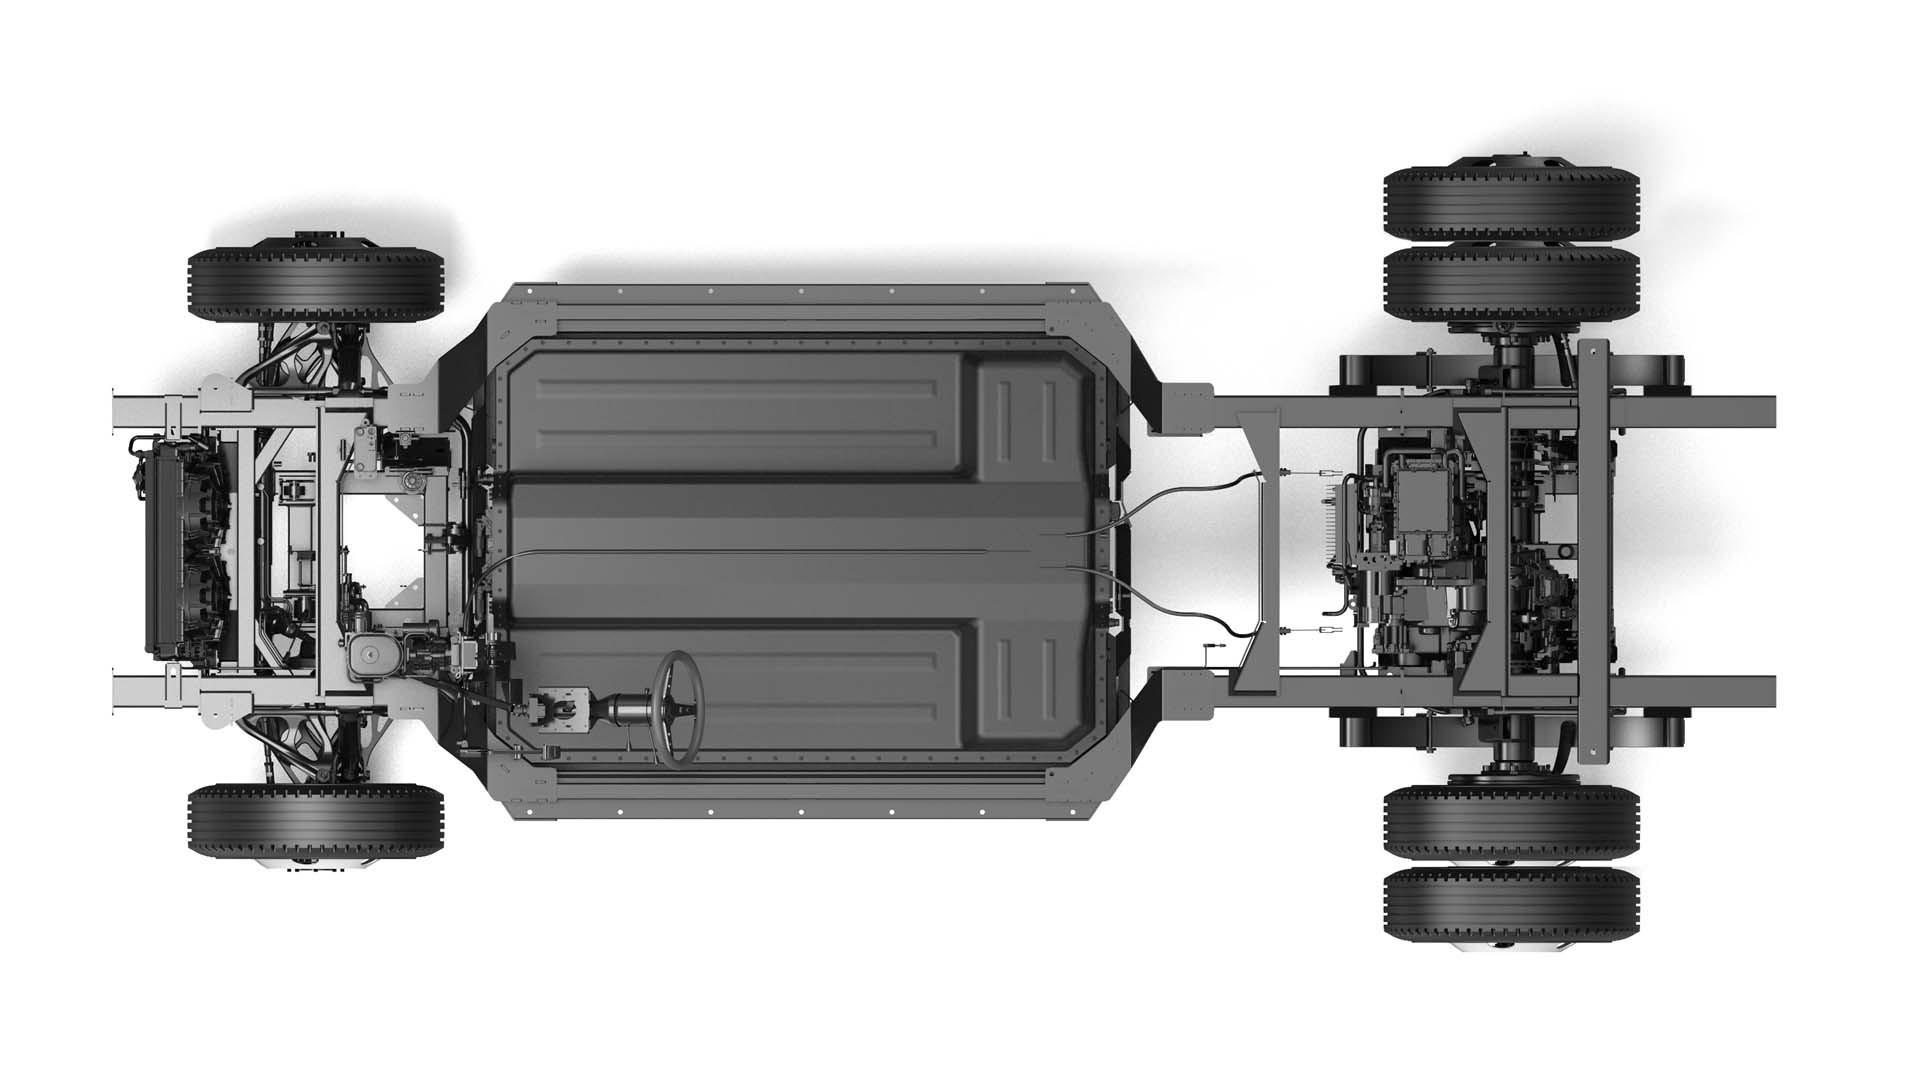 Bollinger Chass-E dually rear-wheel drive